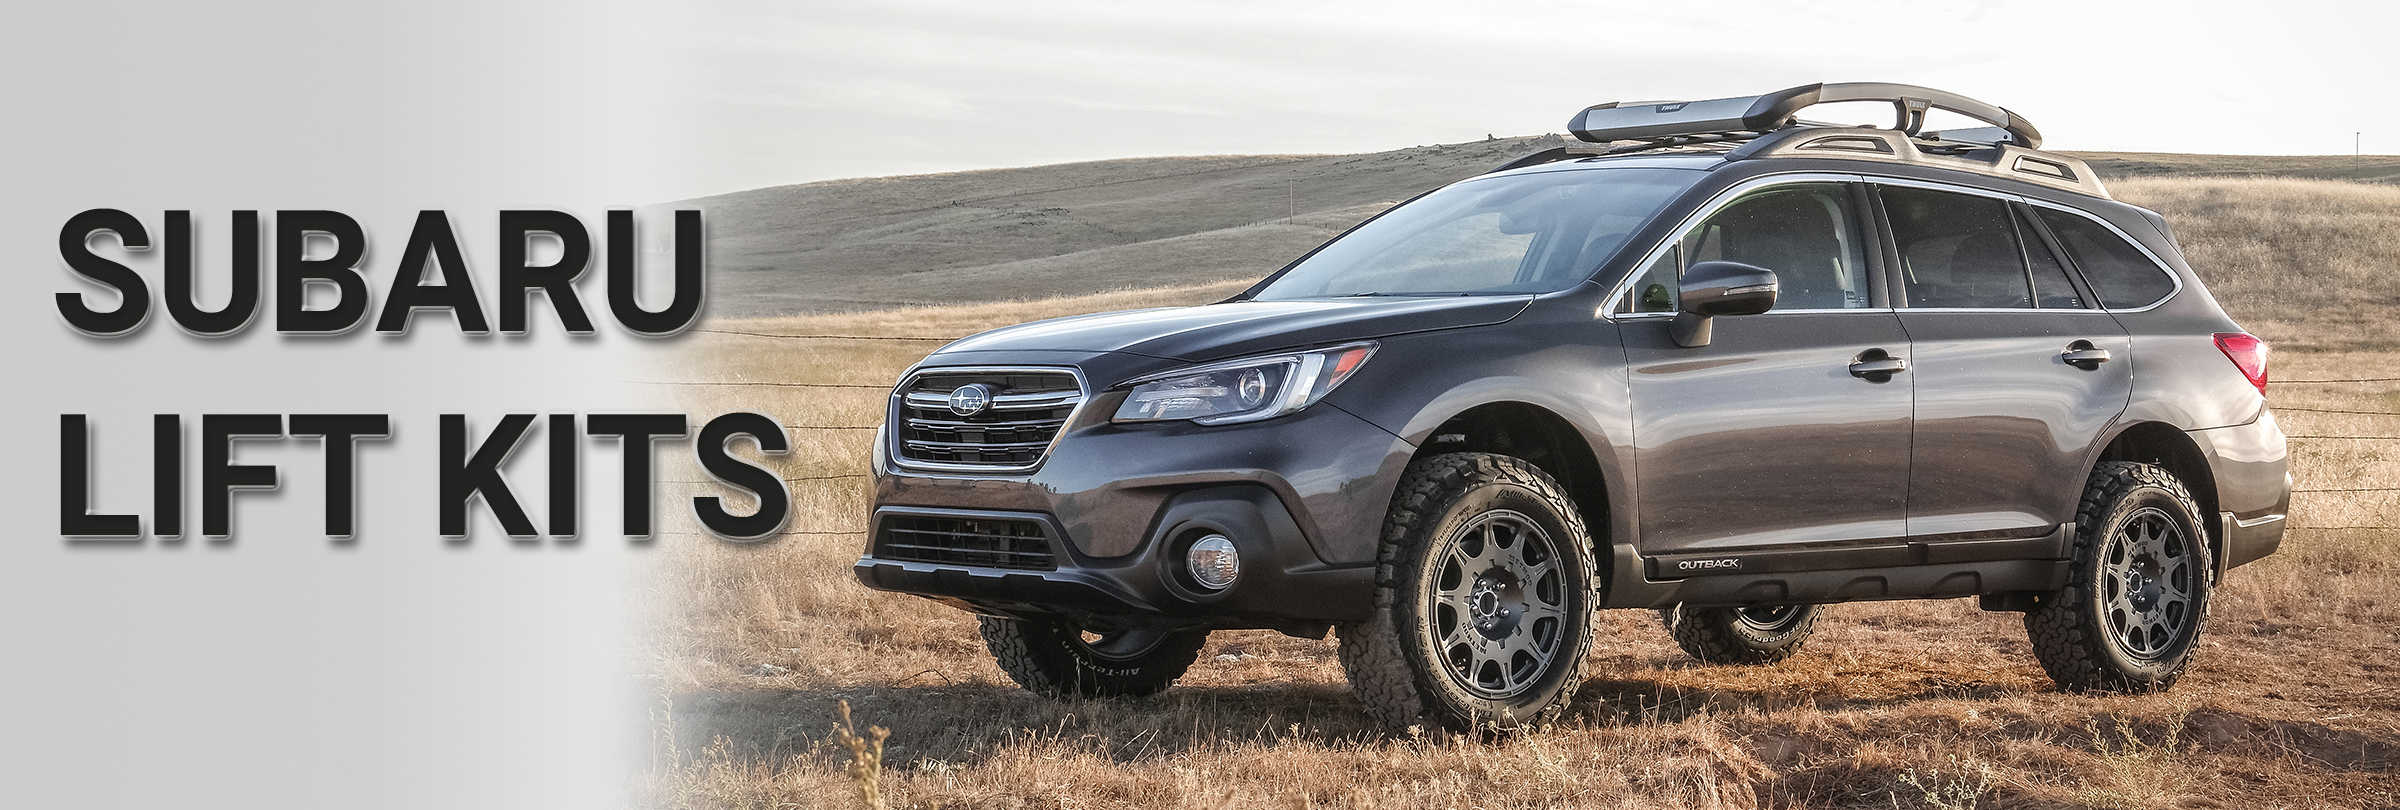 Lifted Subaru Forester >> Subaru Lift Kits Outback Lift Kit Crosstrek Lift Kits